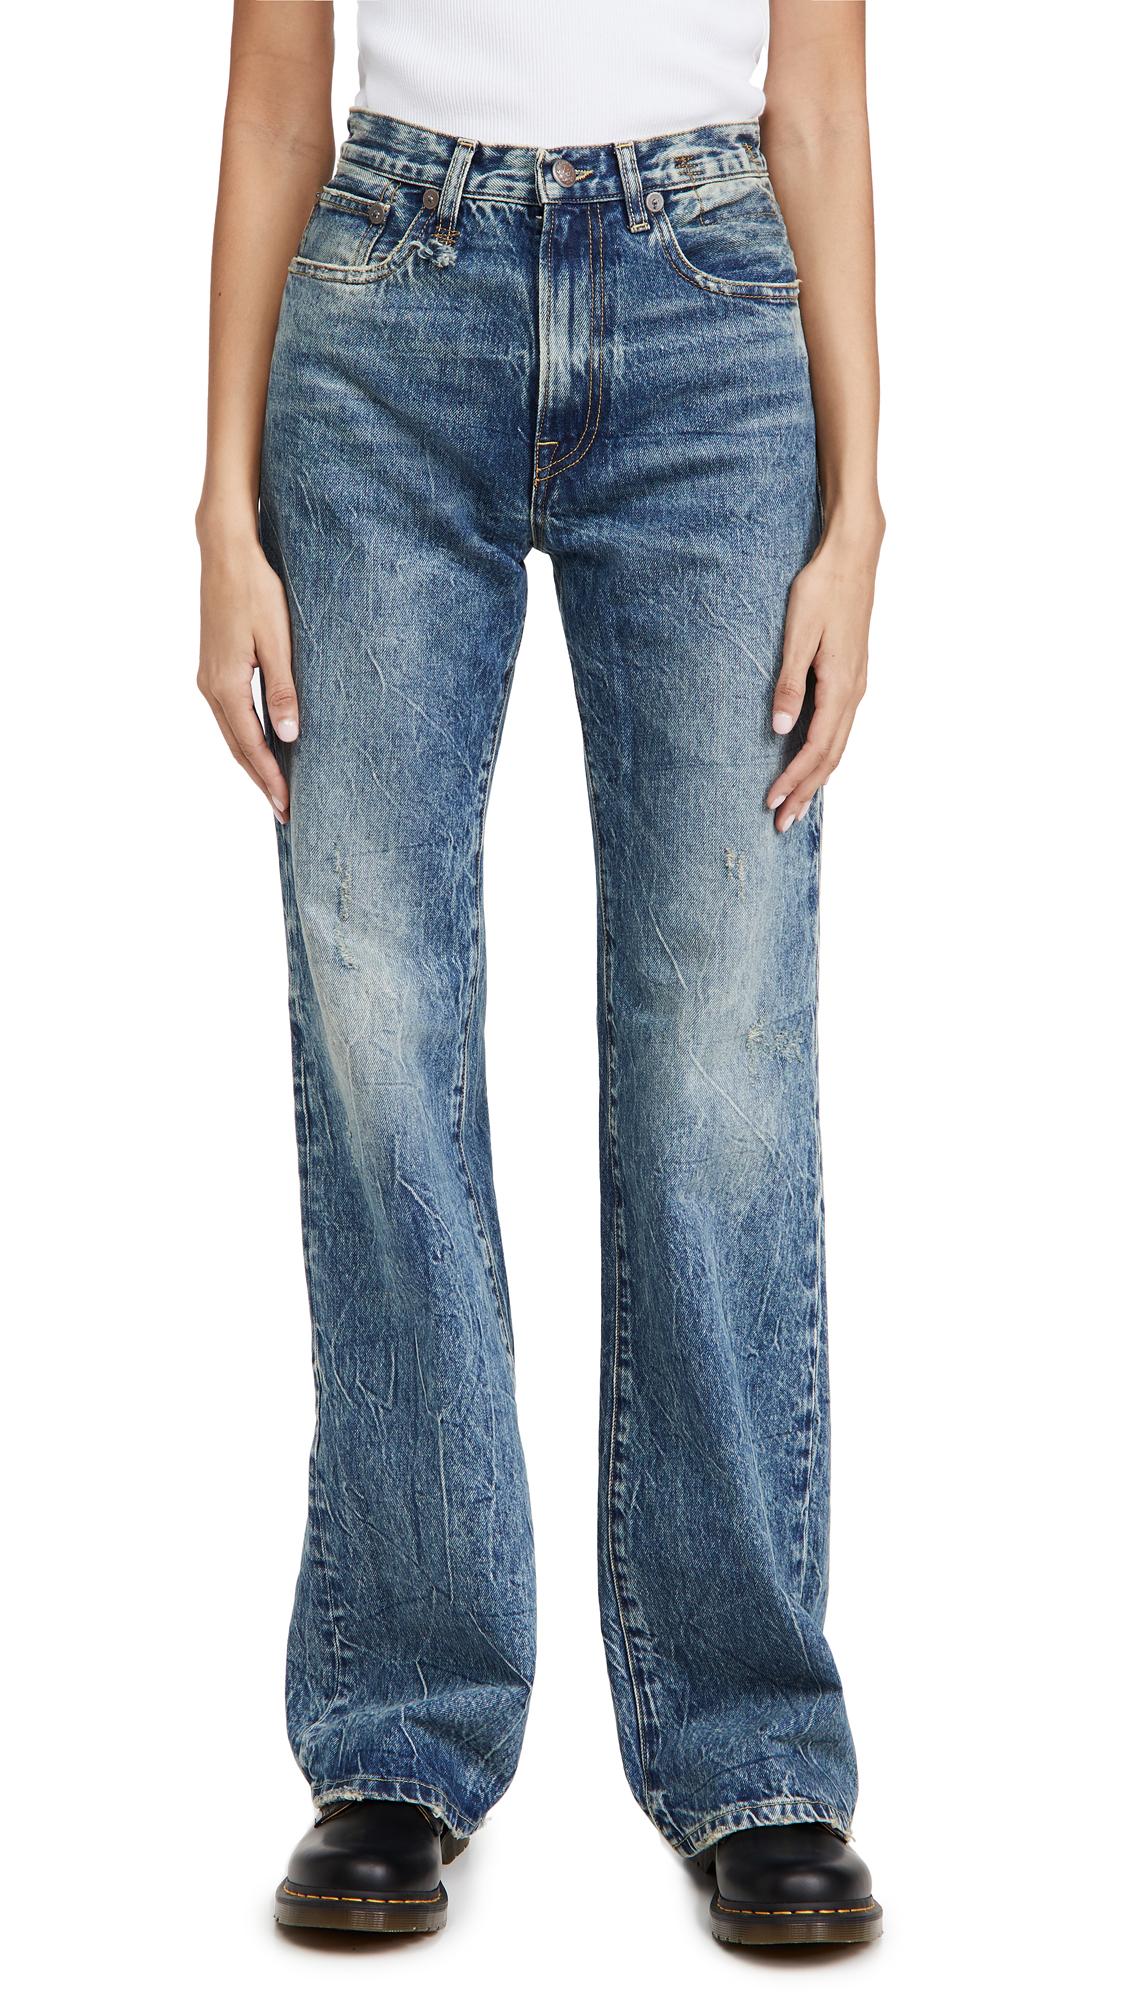 R13 Jane Jeans